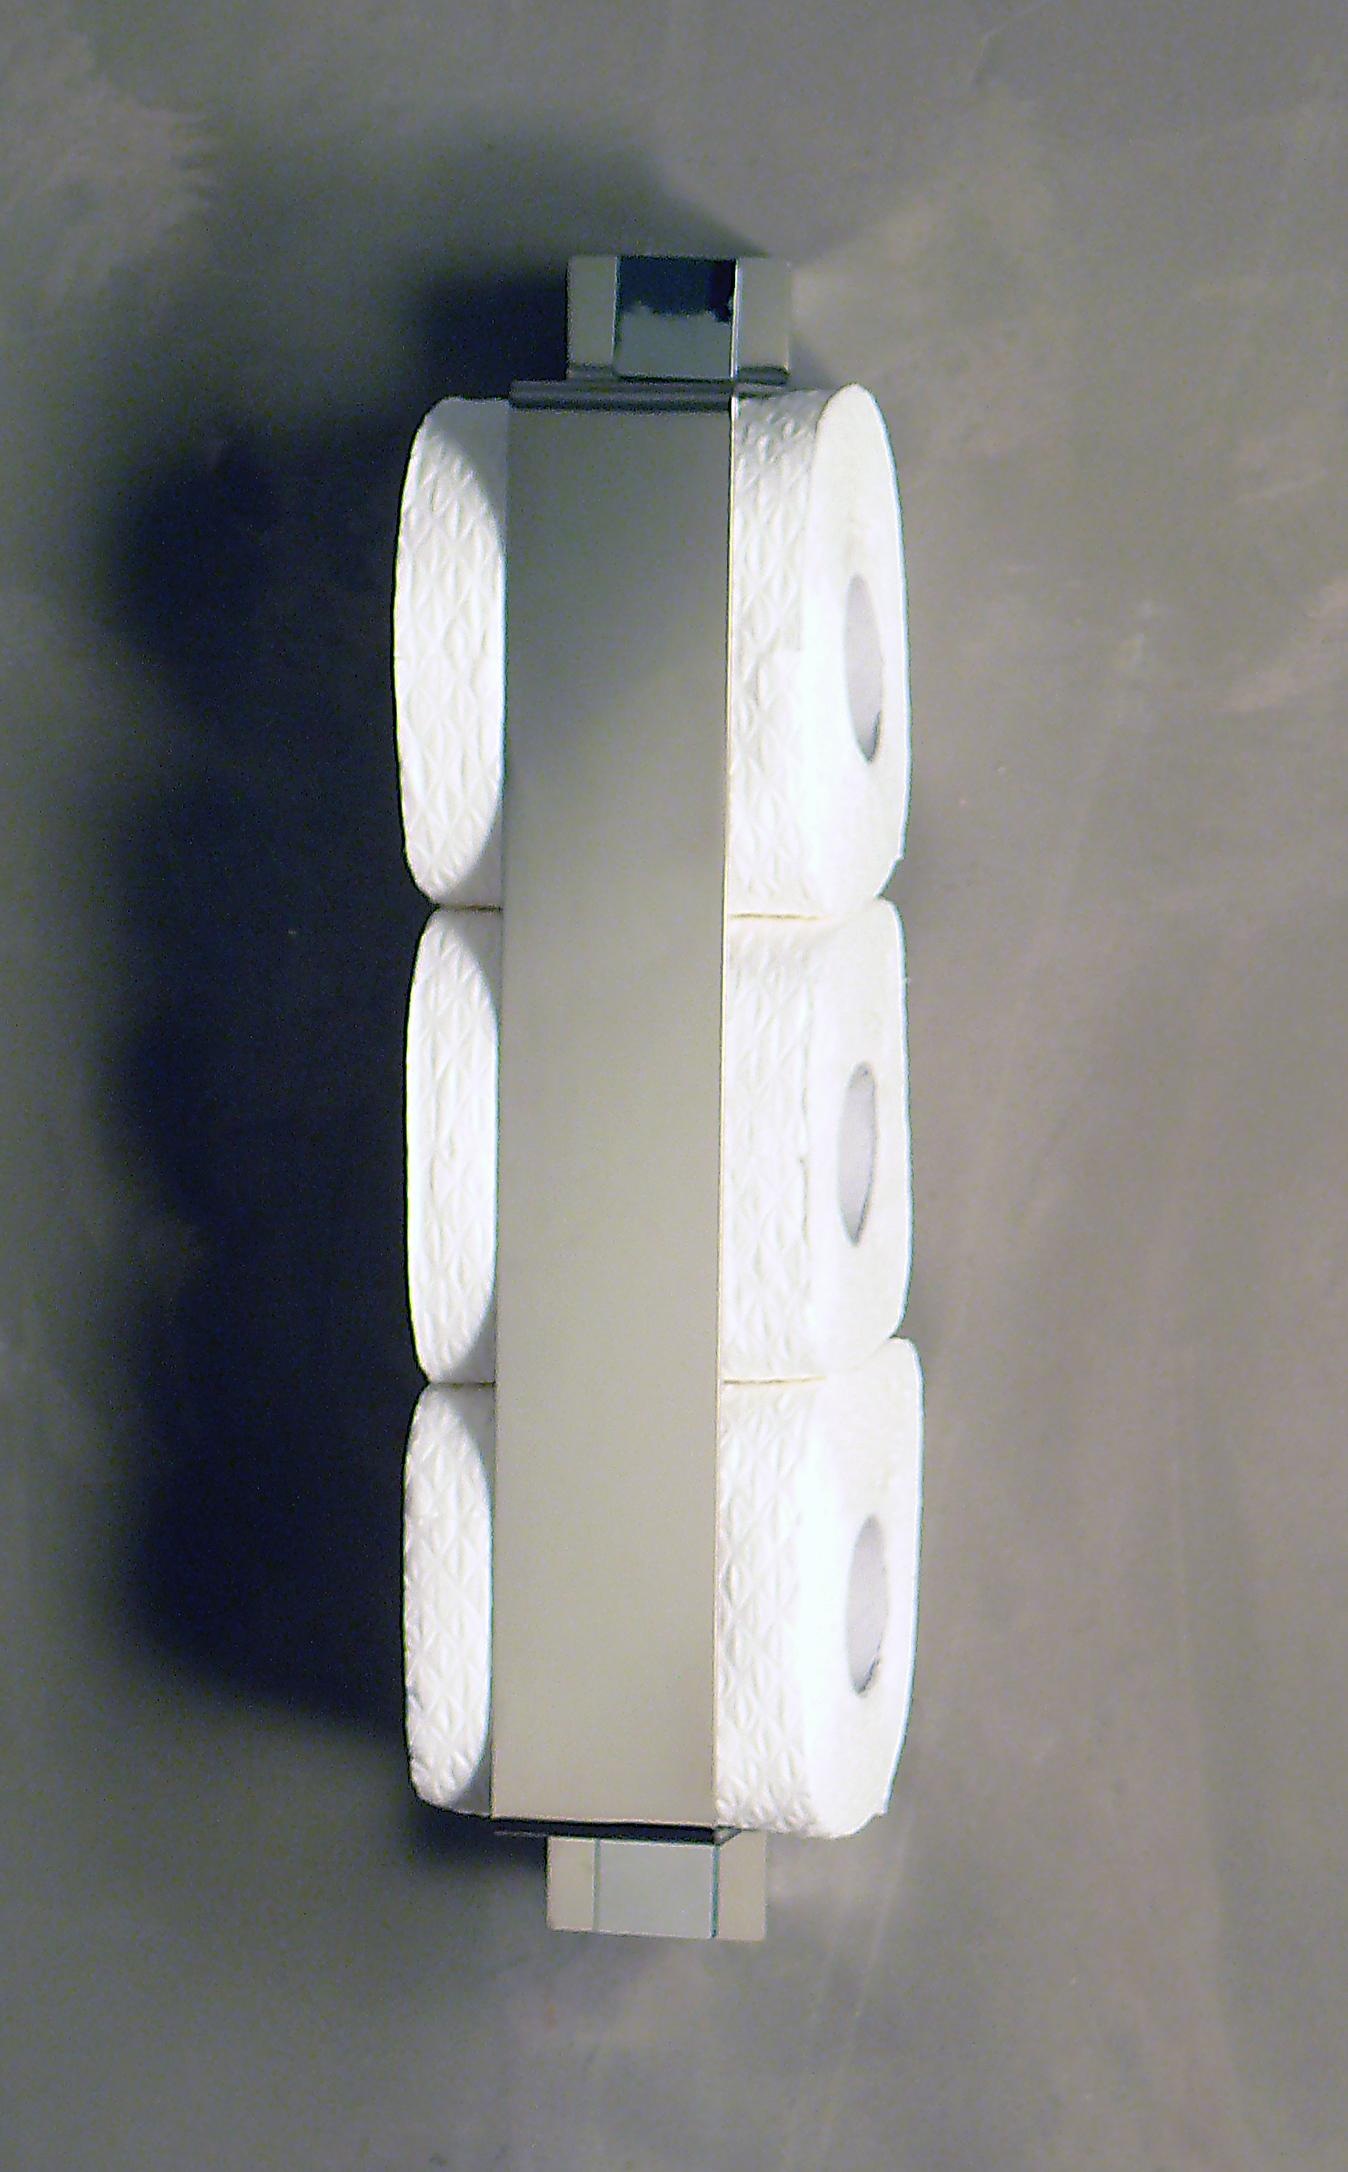 ersatzrollenhalter f r die wand edelstahl azizumm shop. Black Bedroom Furniture Sets. Home Design Ideas